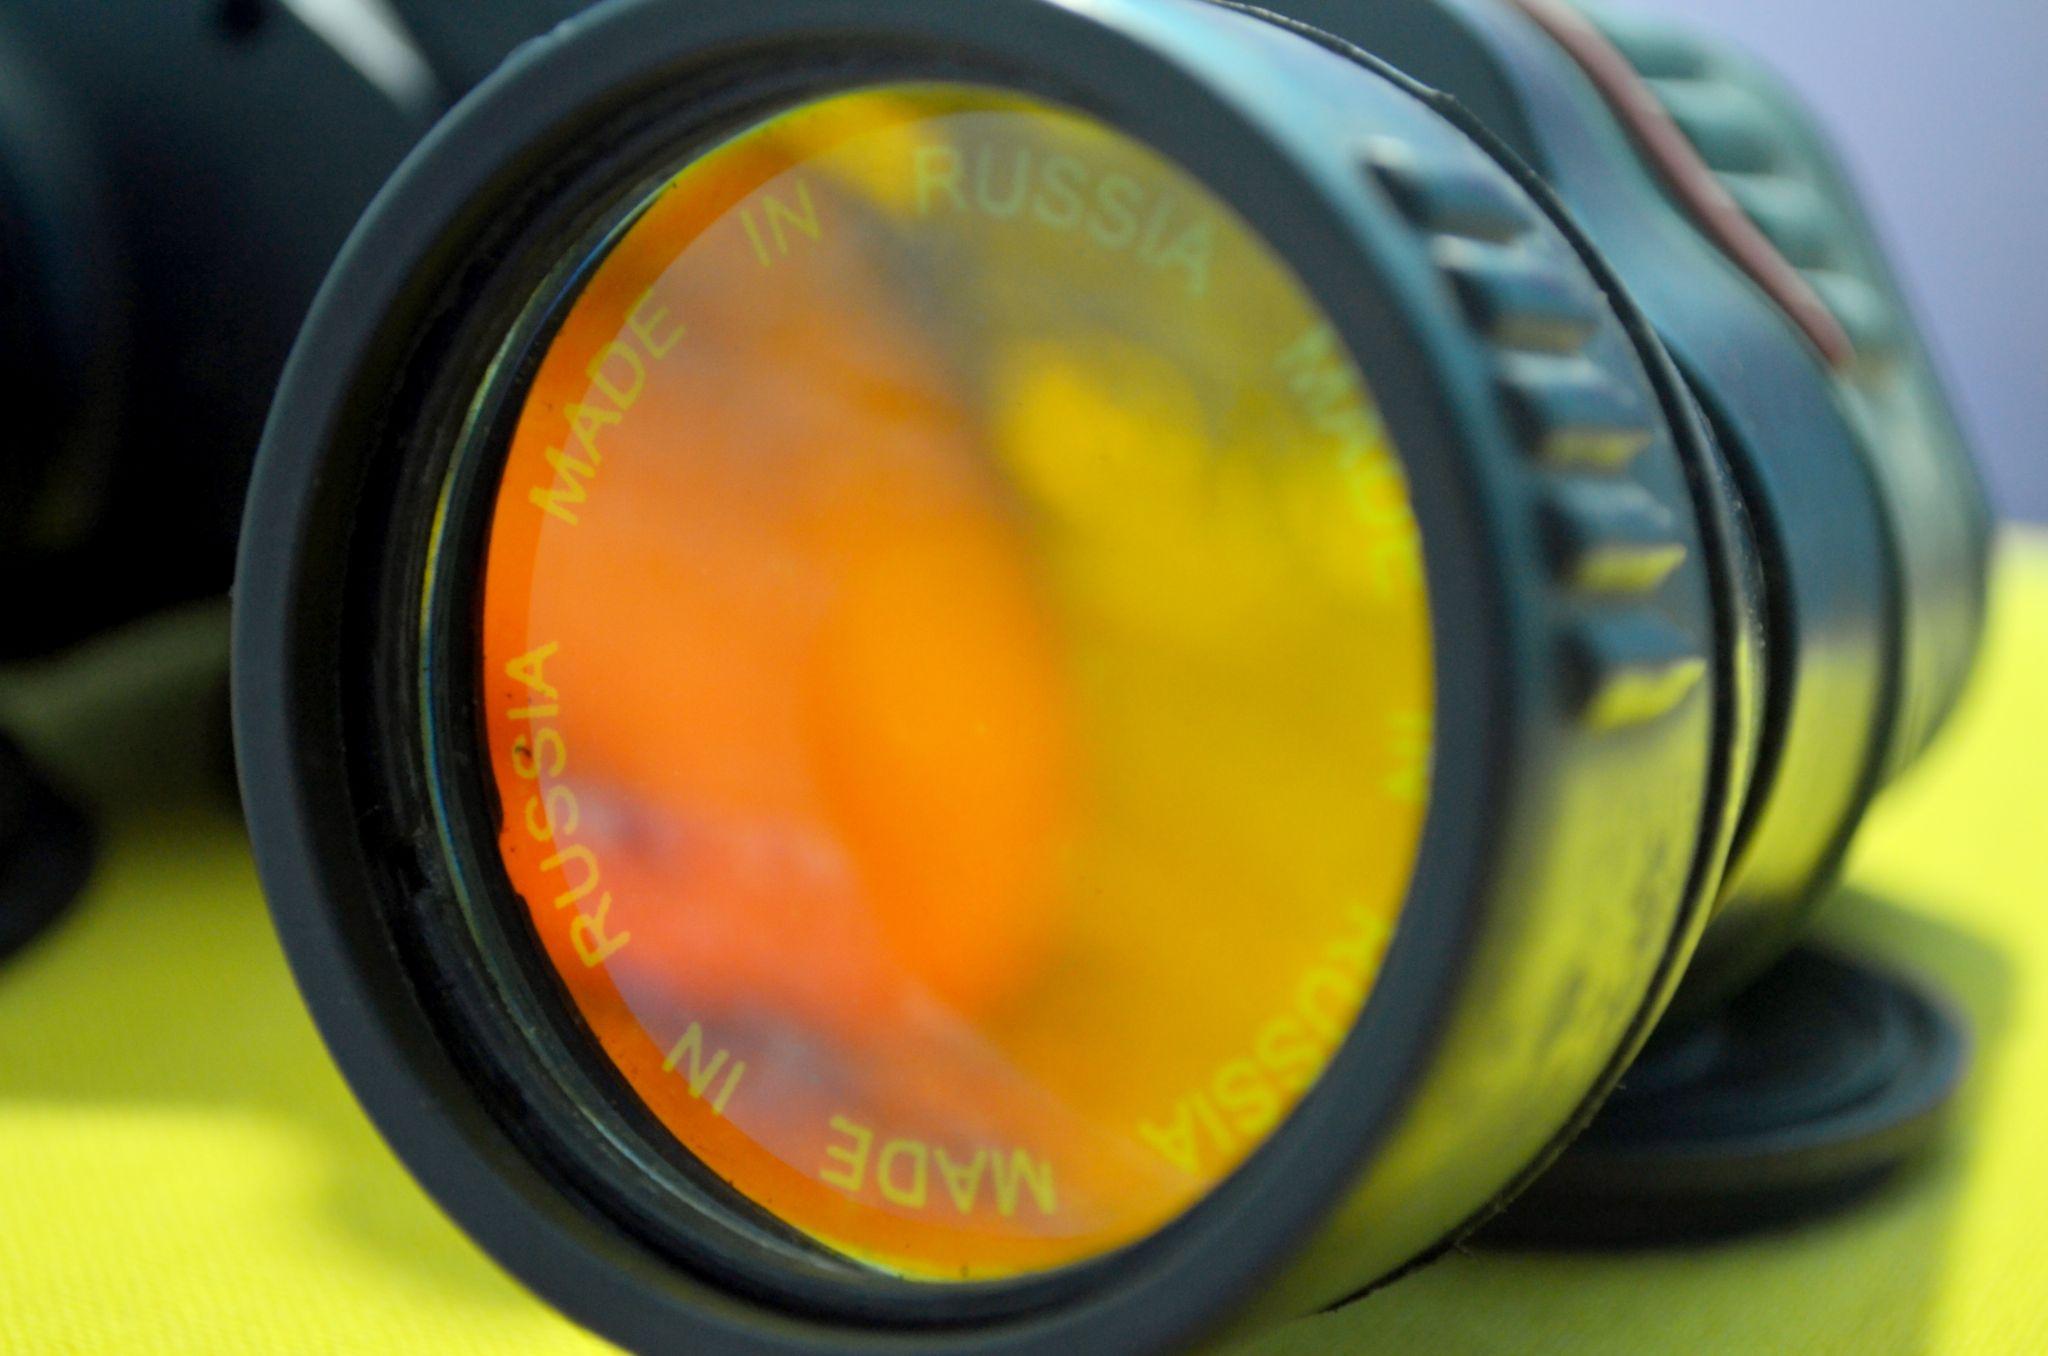 Binoculars by Pankaj Kumar